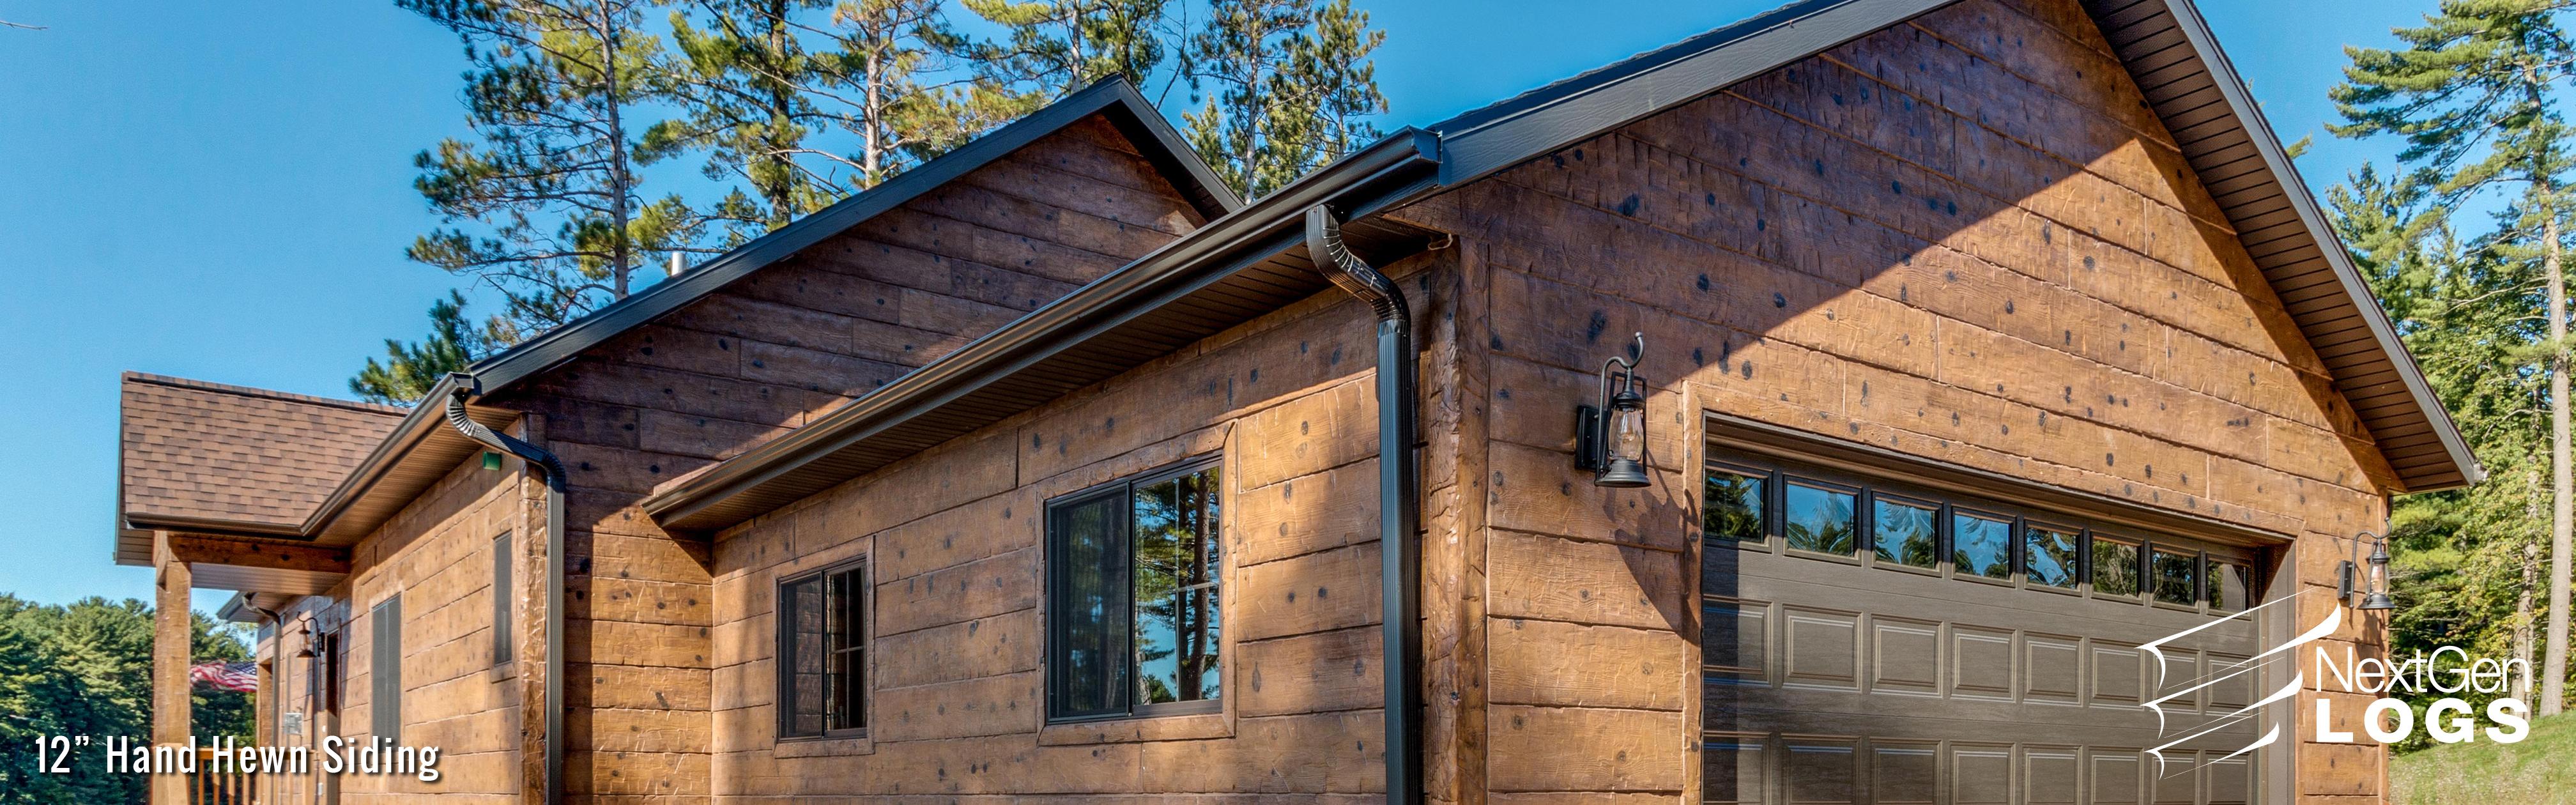 NextGen_Logs_Concrete_Log_Siding_hand_hewn_timbers_siding